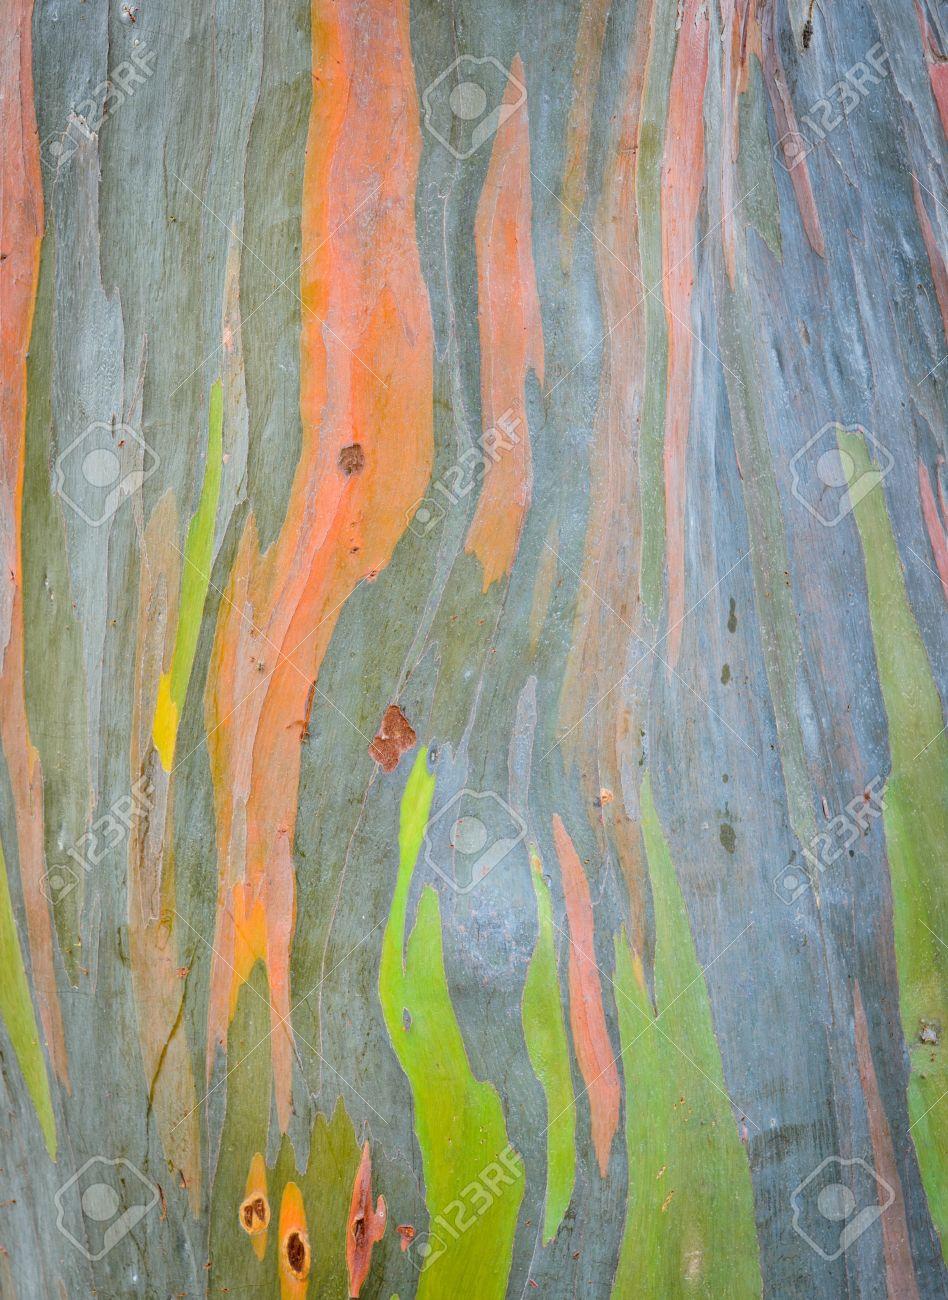 Background Of Rainbow Eucalyptus Tree Bark Stock Photo, Picture And ...